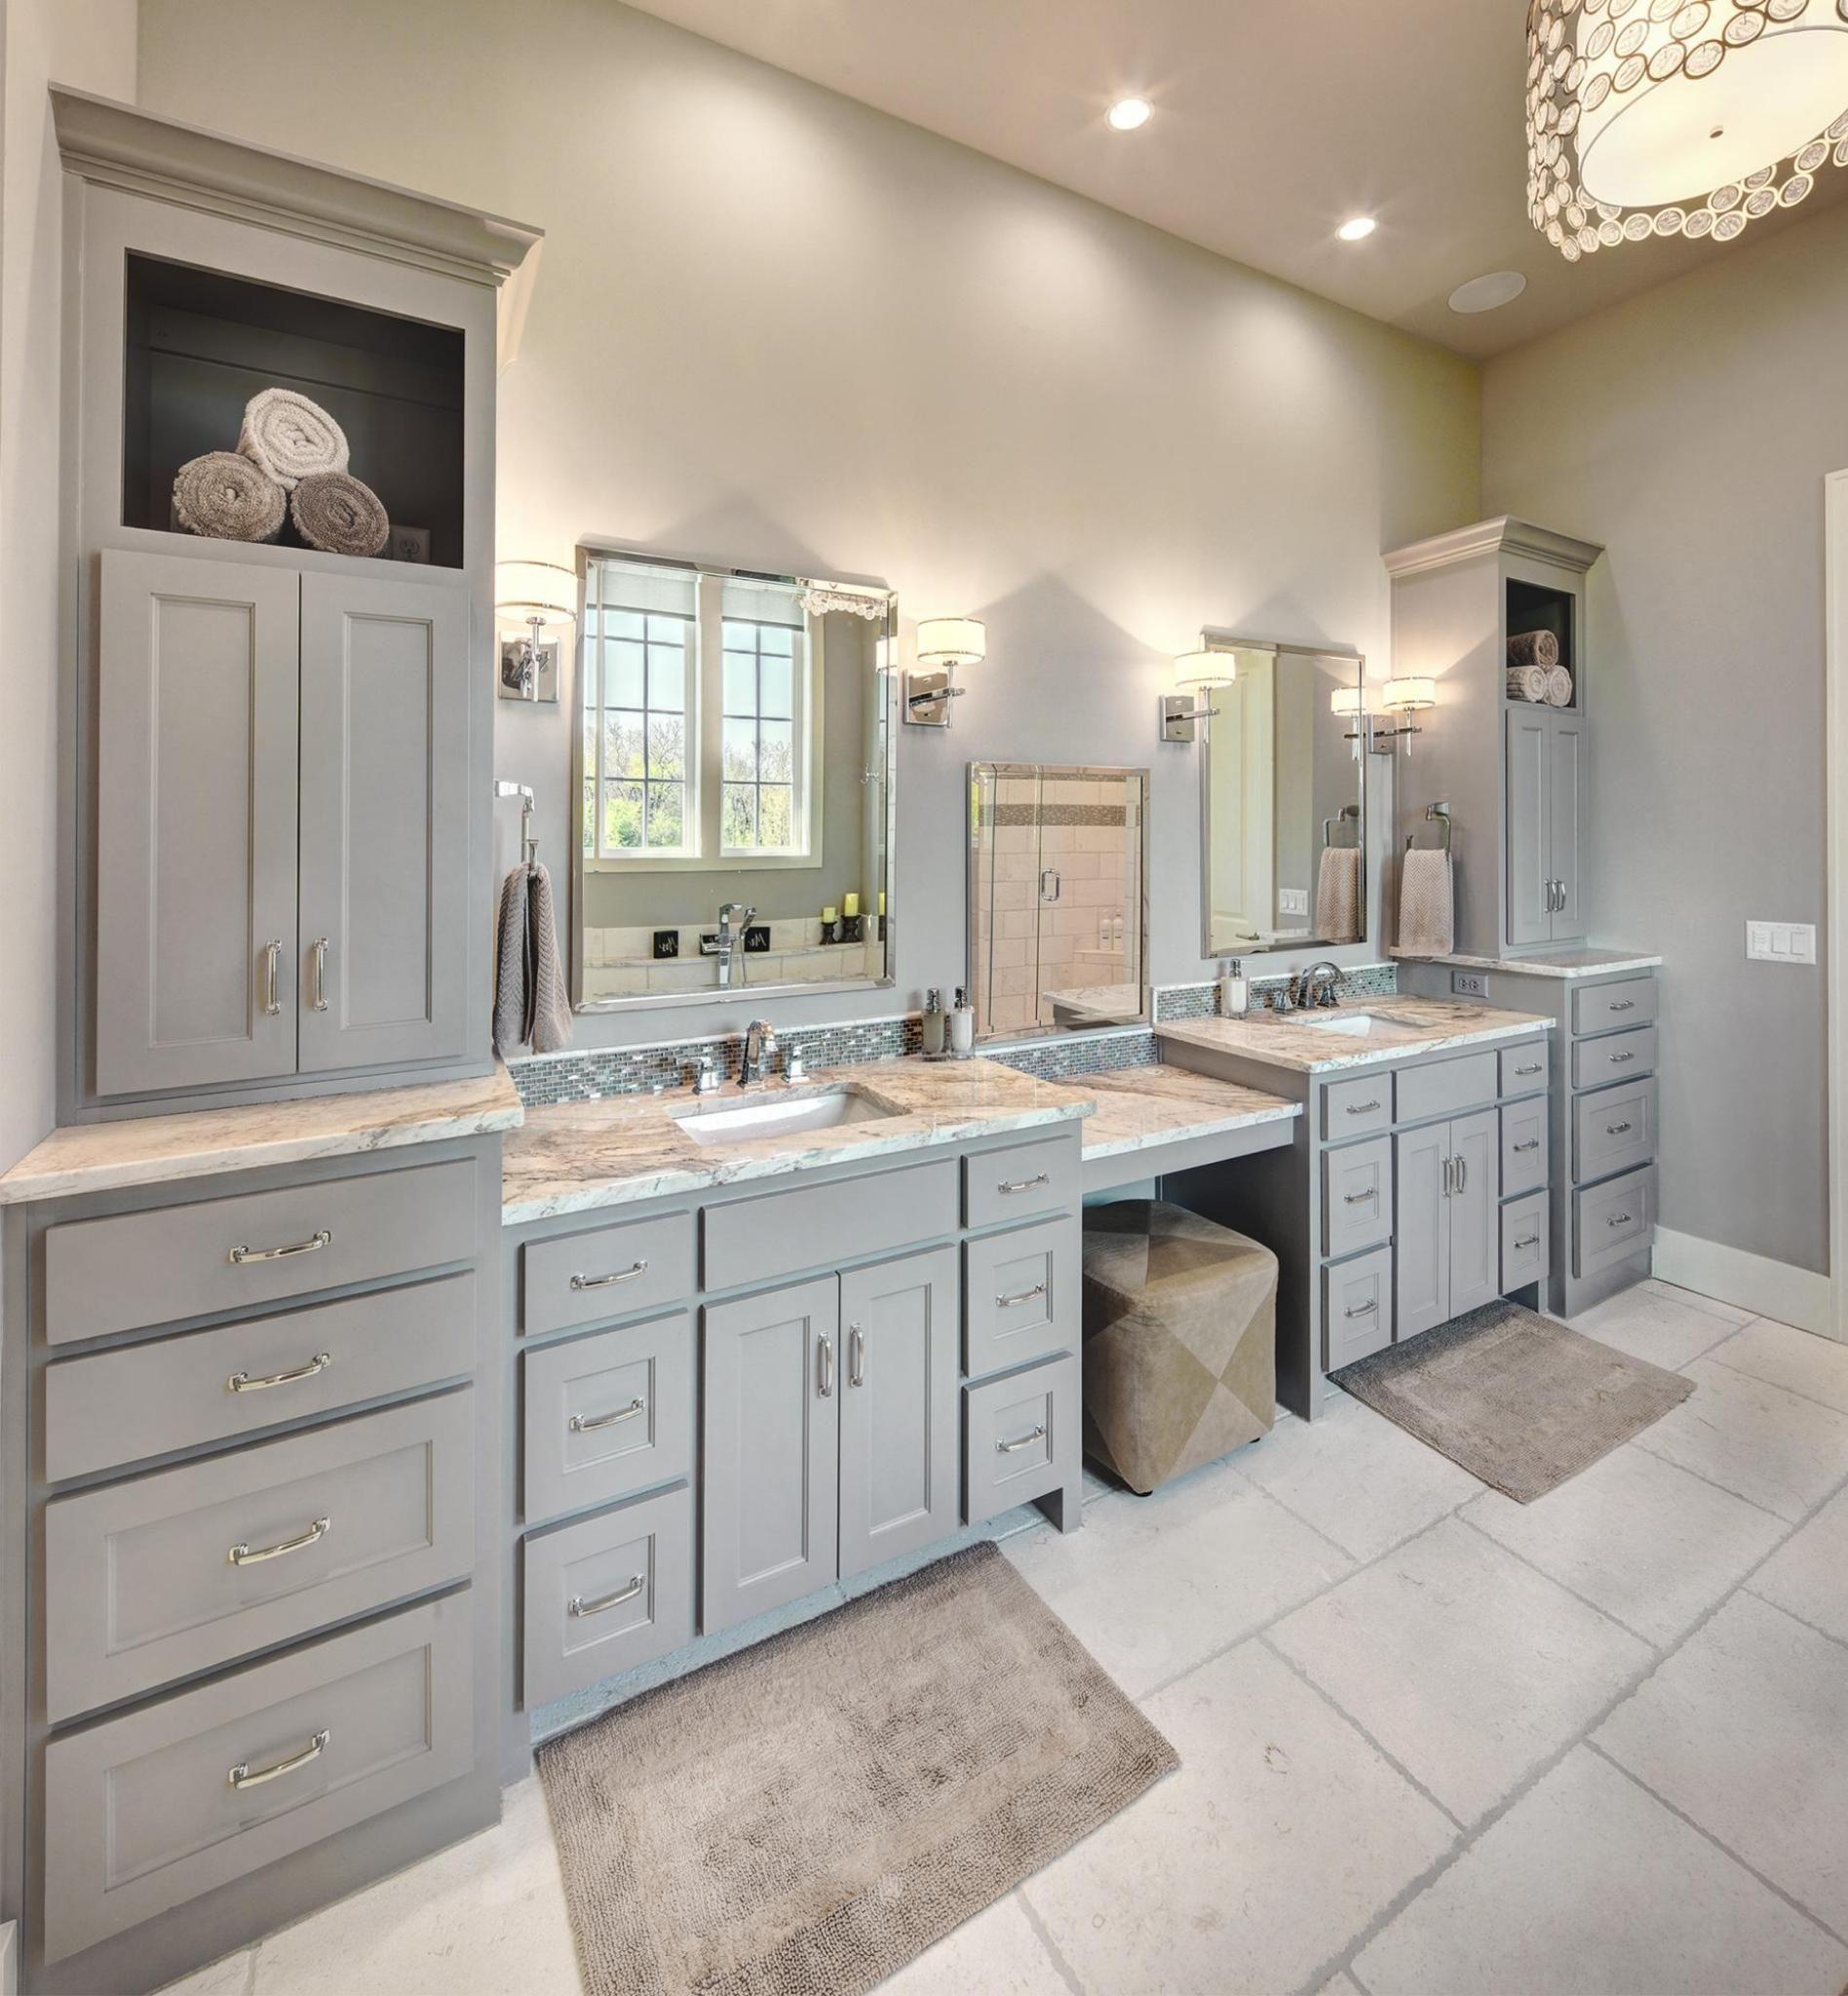 Pin By Kim Carroll On Diy Home Improvement Ideas Master Bathroom Design Classic Bathroom Modern Master Bathroom [ jpg ]